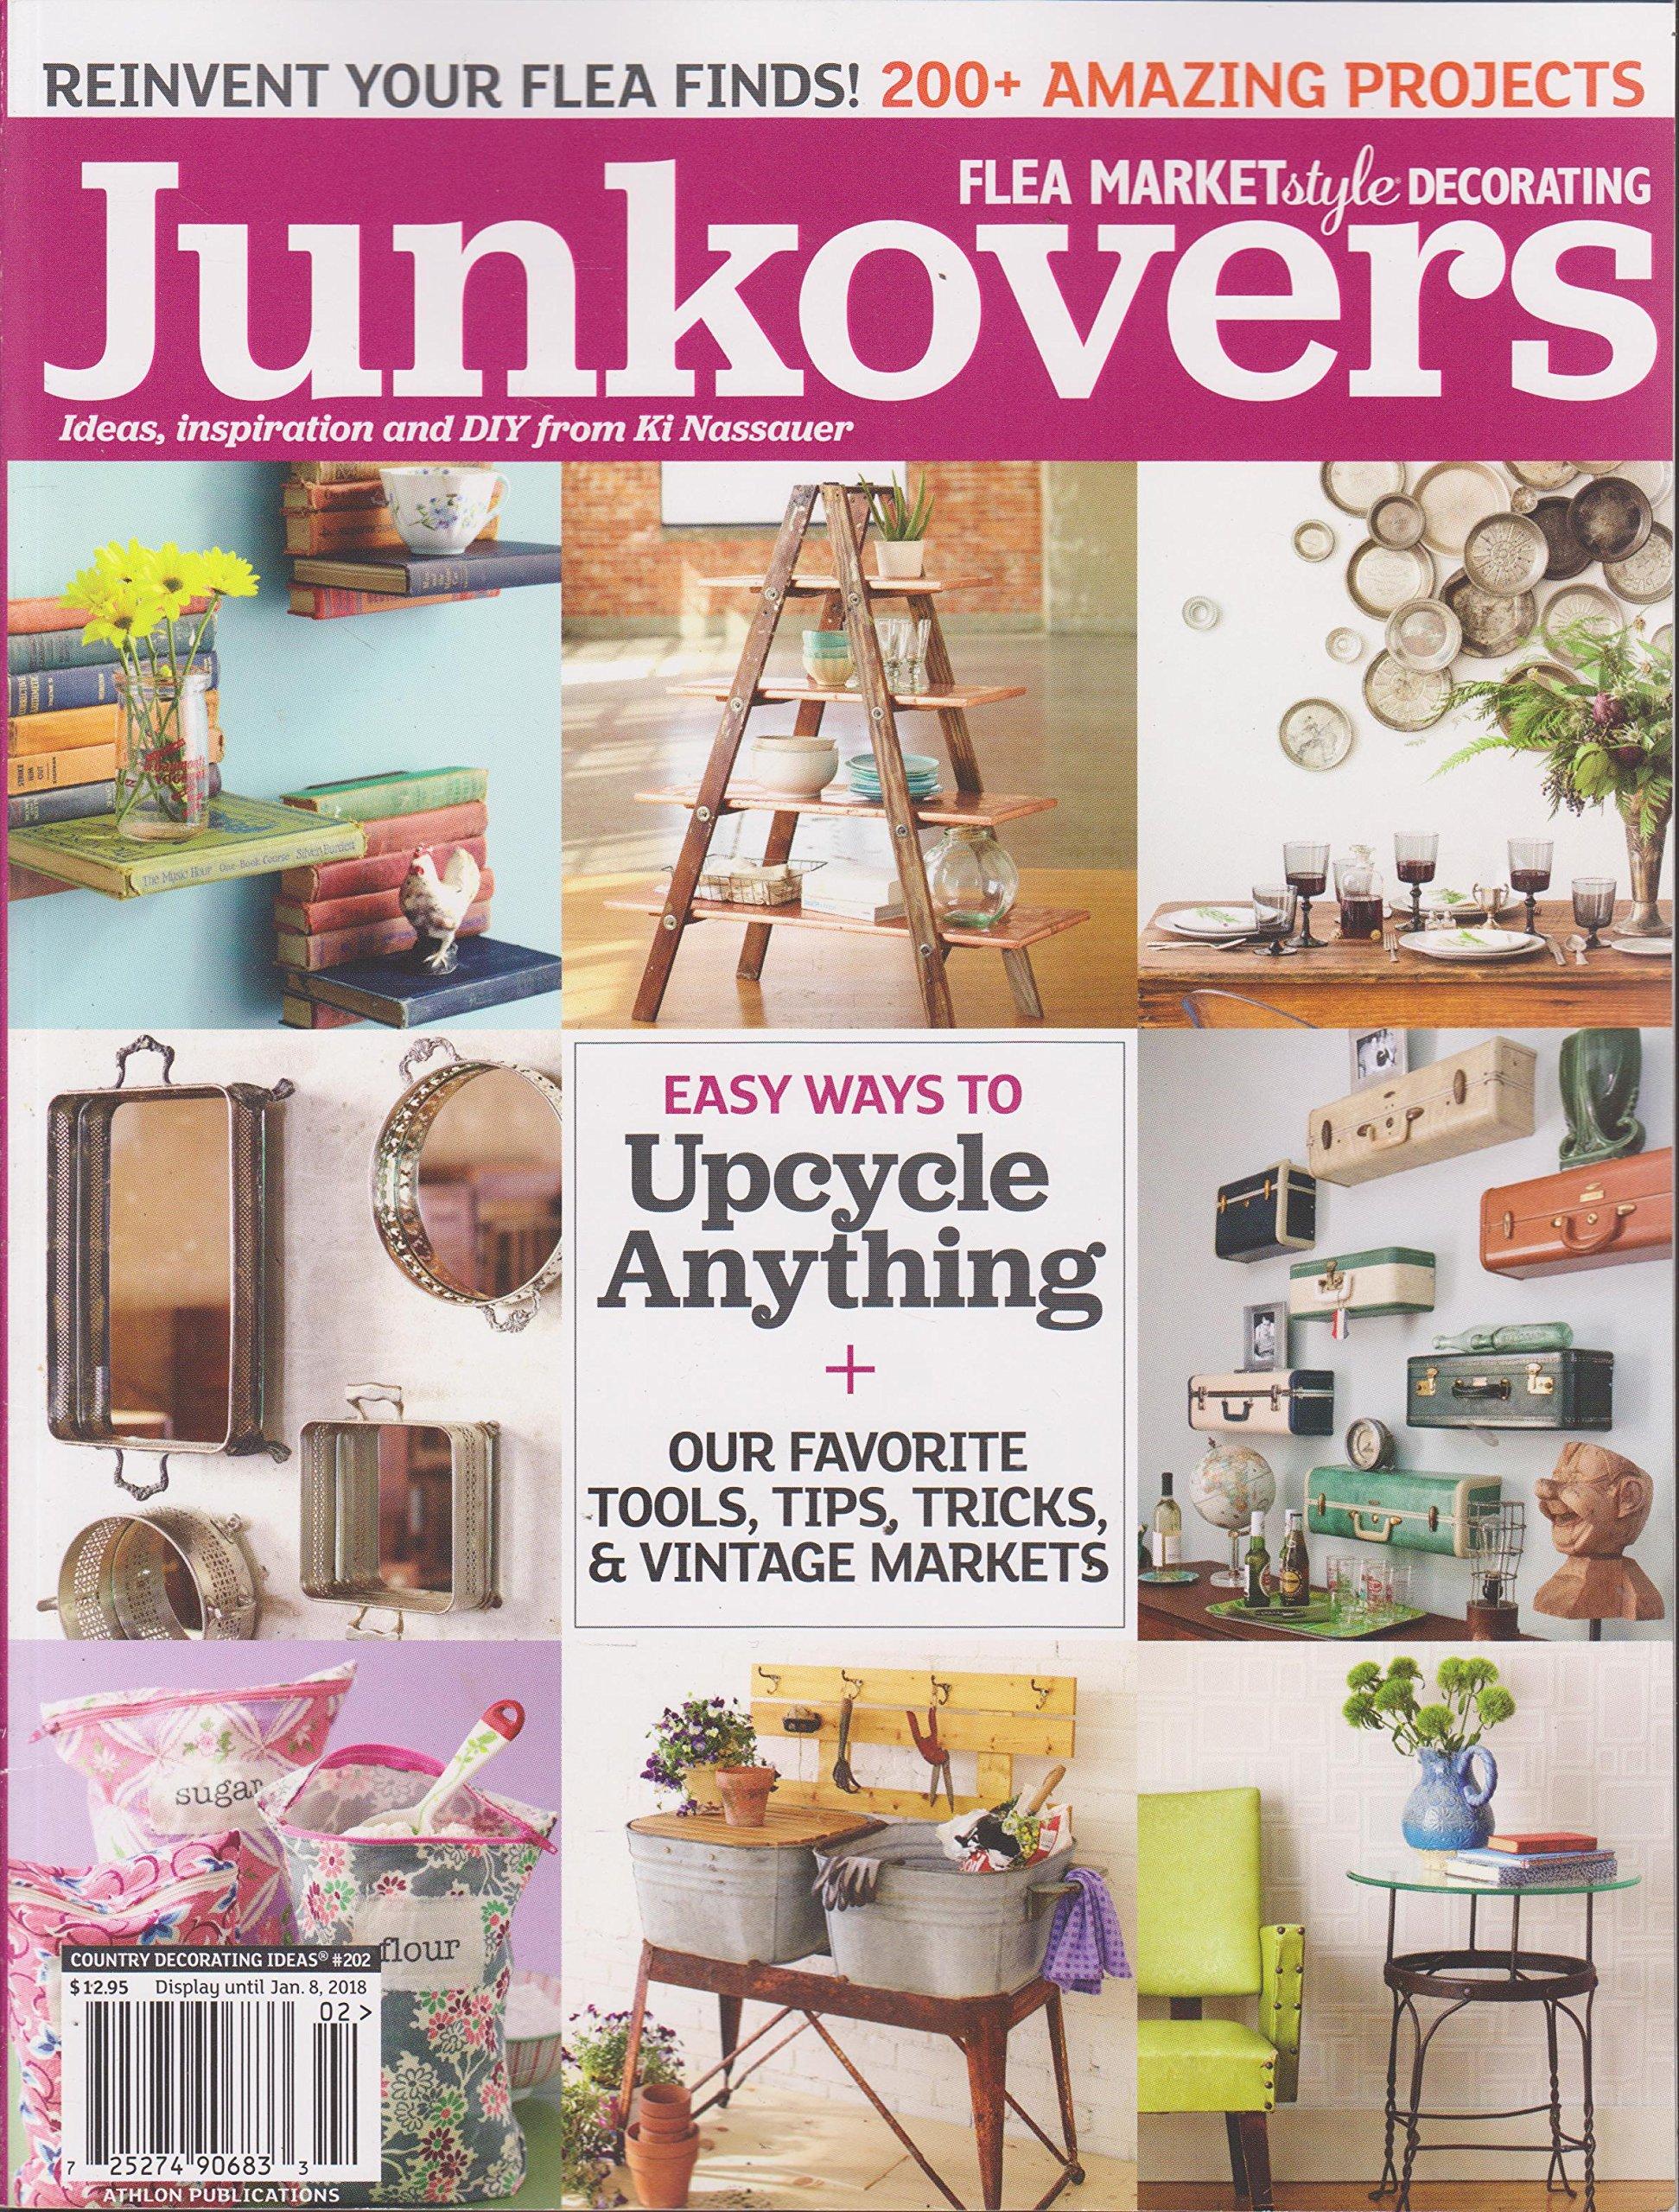 Flea Market Style Decorating Junkovers Magazine Country ...